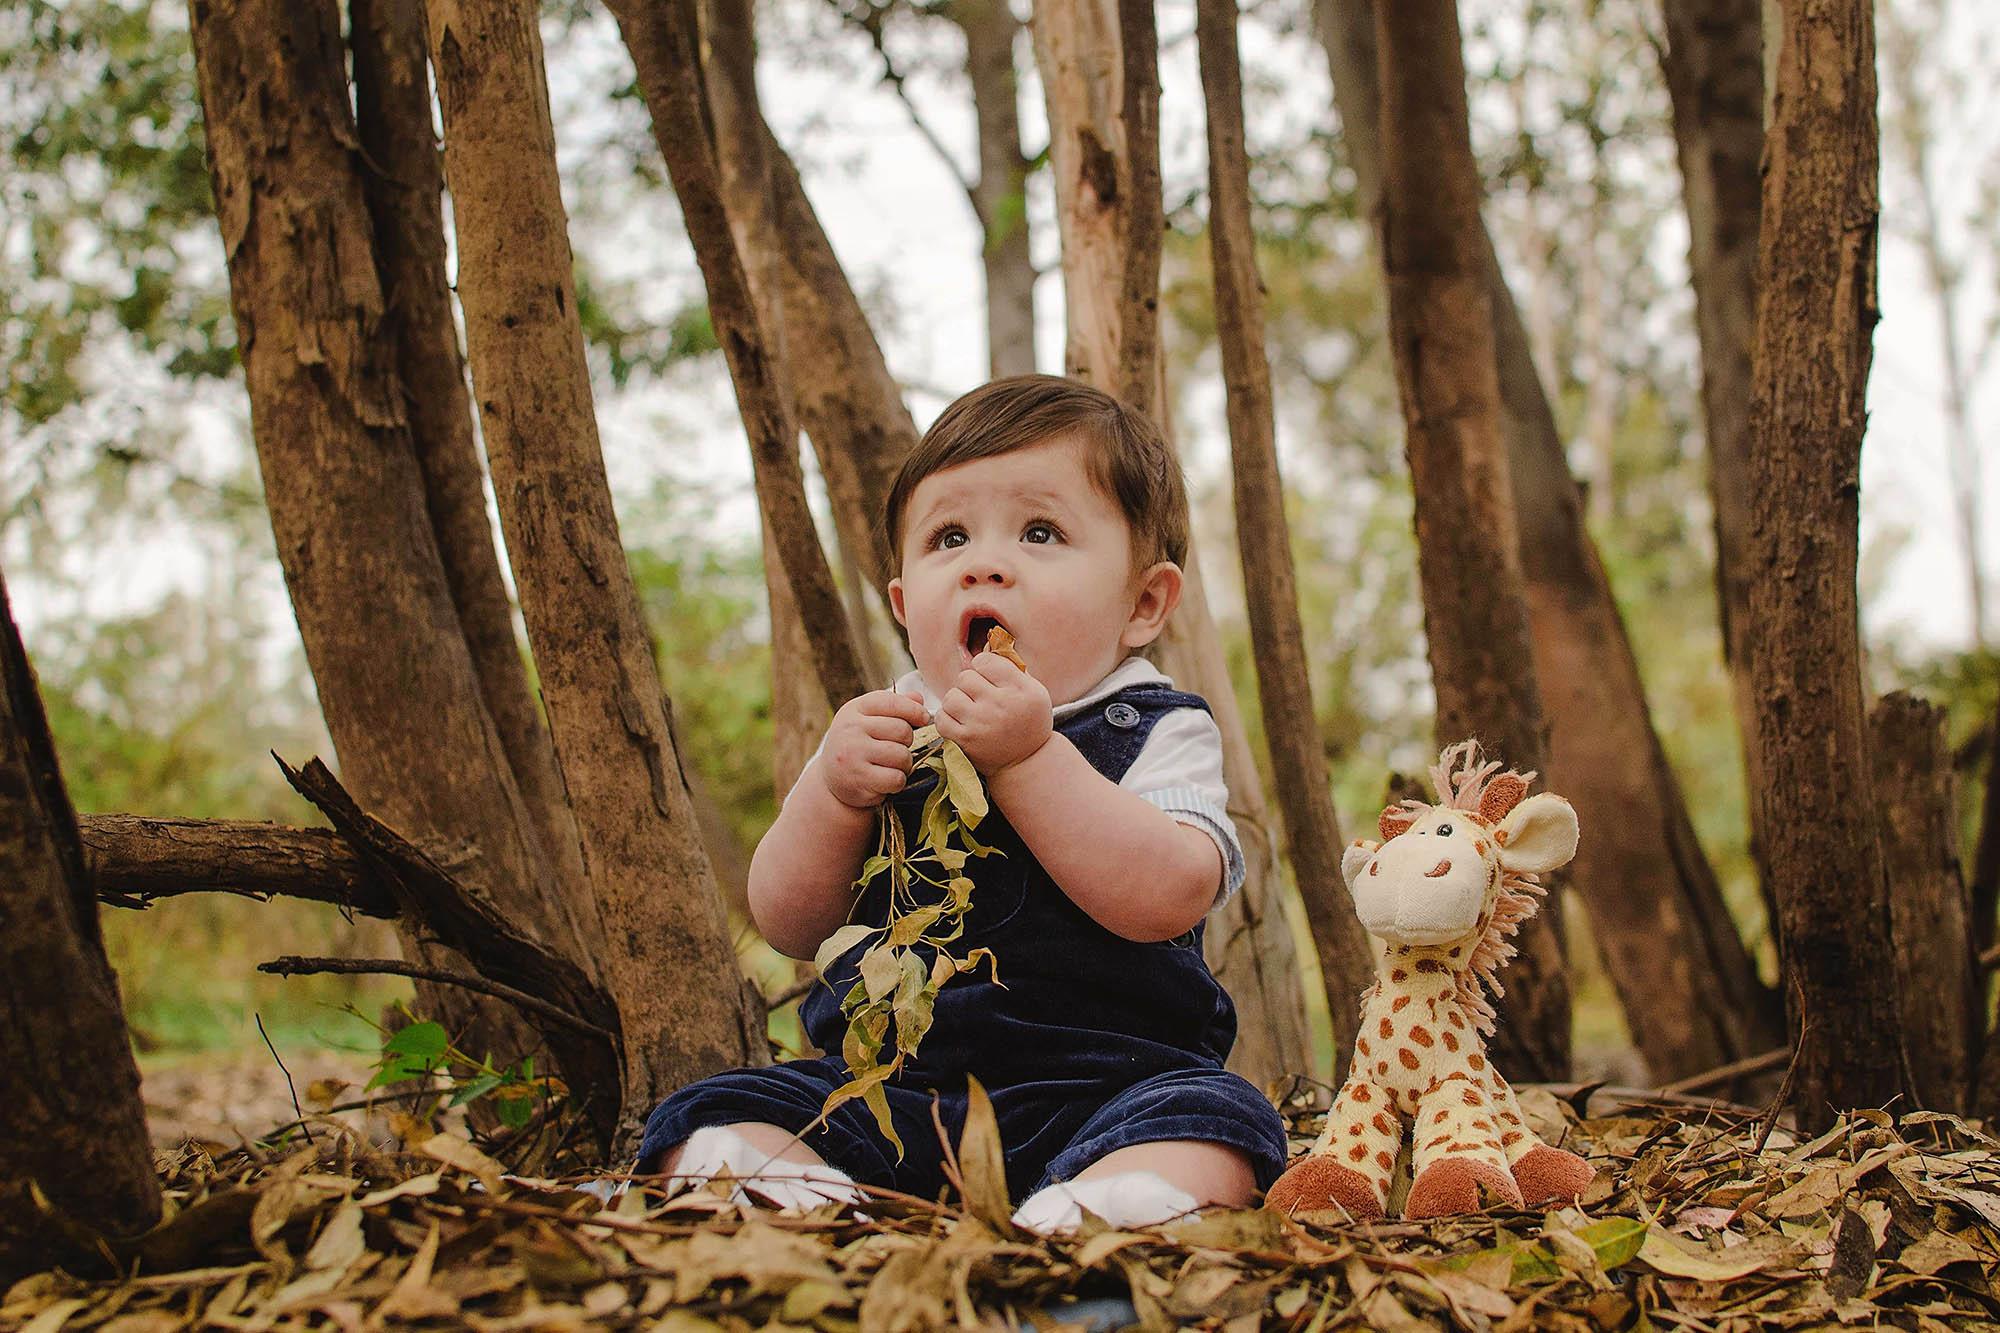 fotografo-de-familia-Queretaro-Emiliano-5.jpg